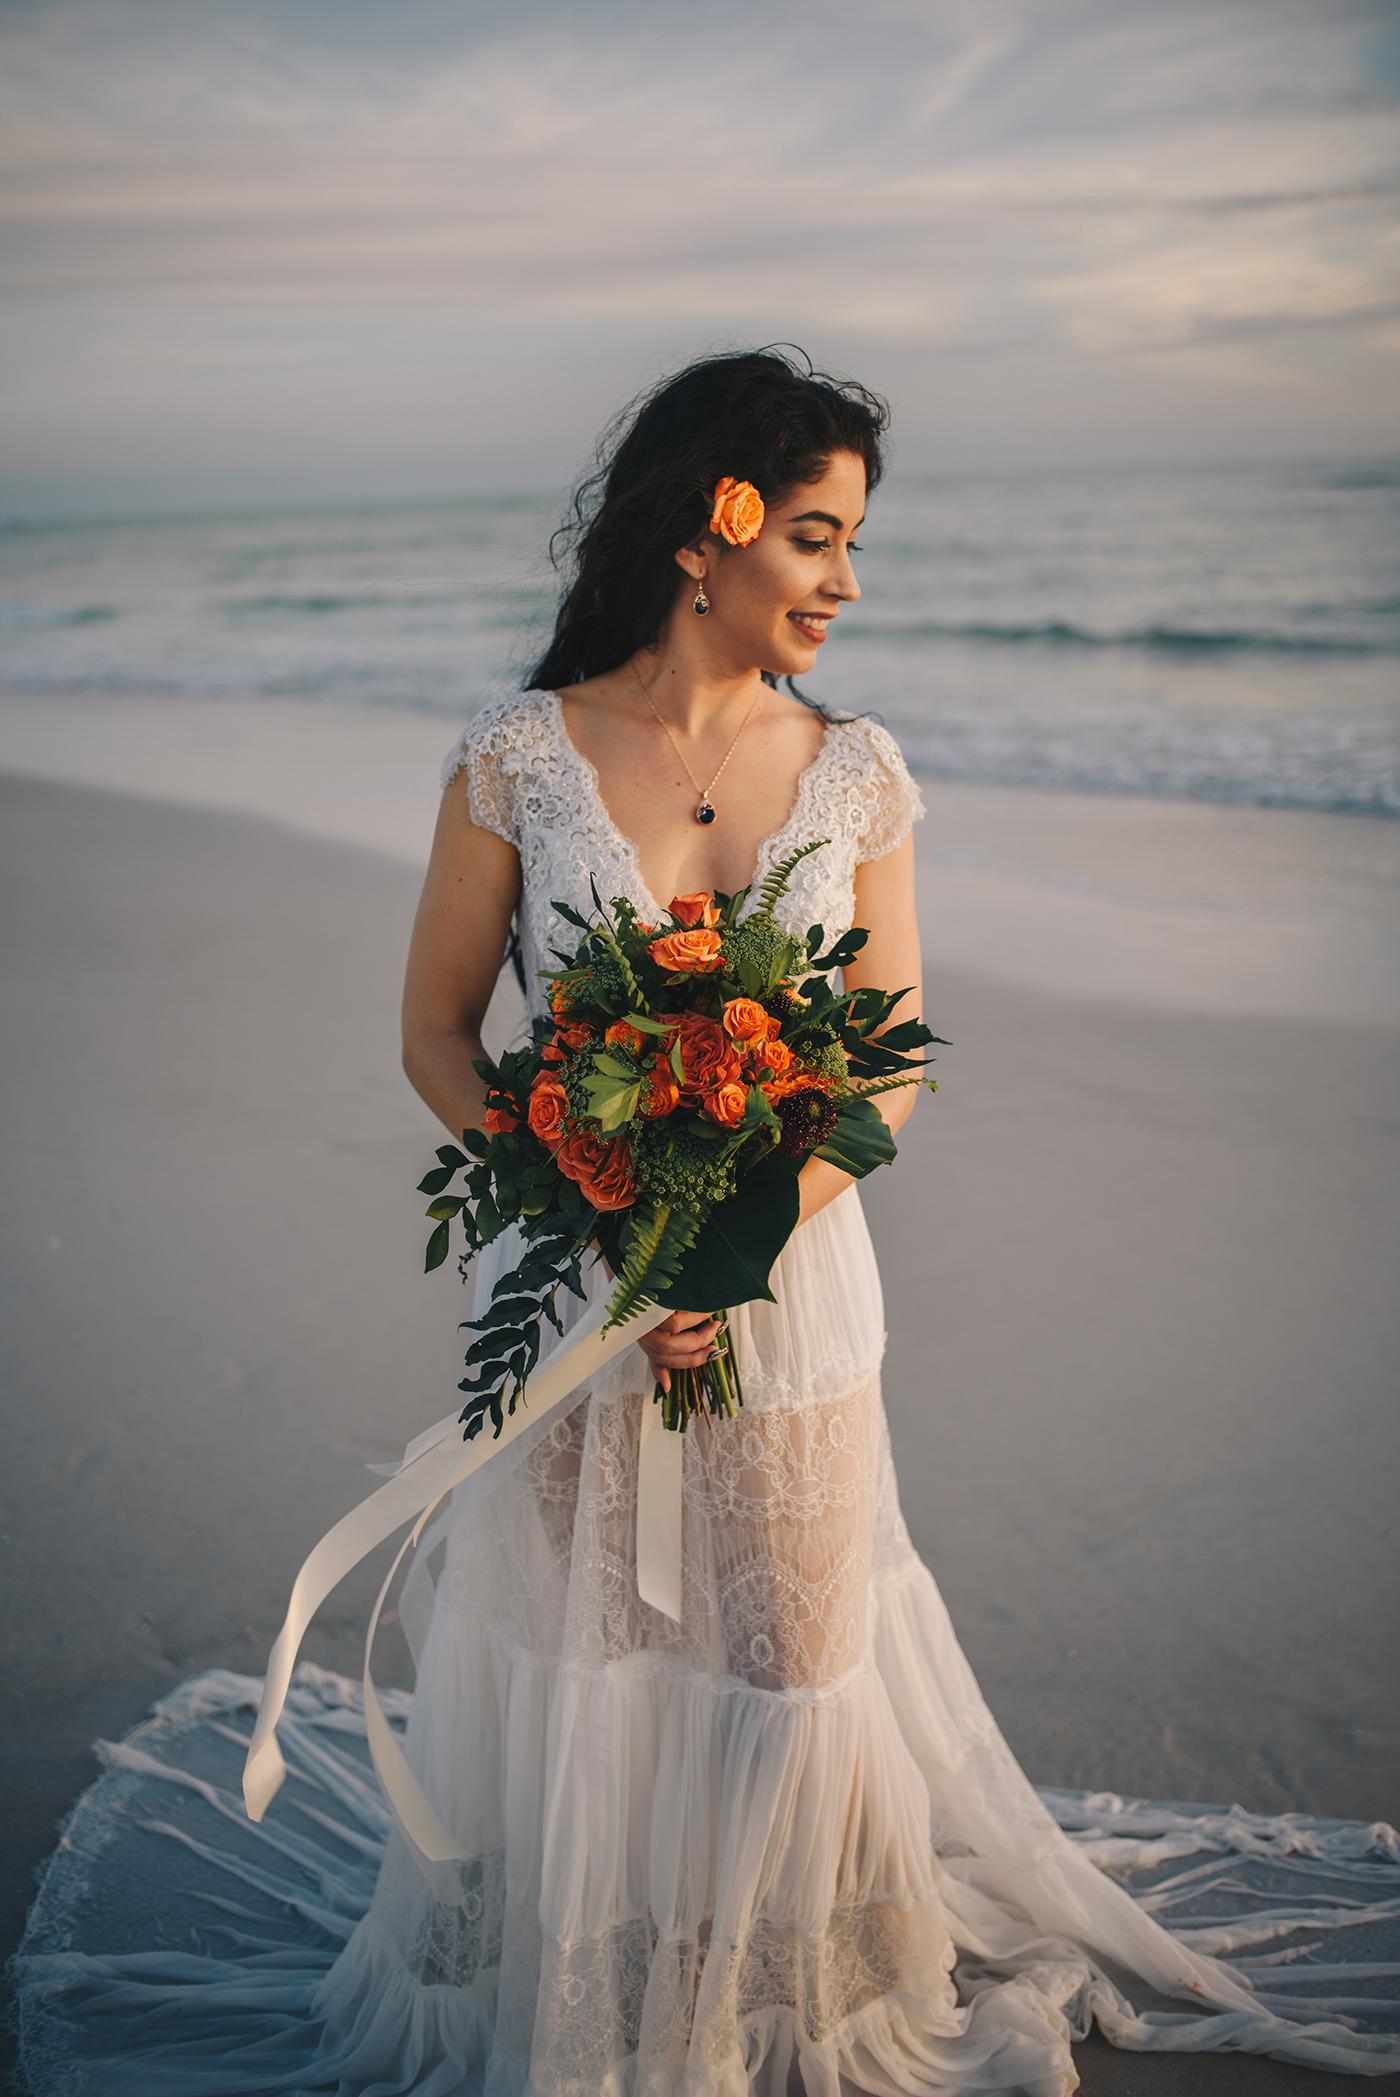 Los-Vargas-Photo-Moana-Wedding-Style-shoot-101.jpg